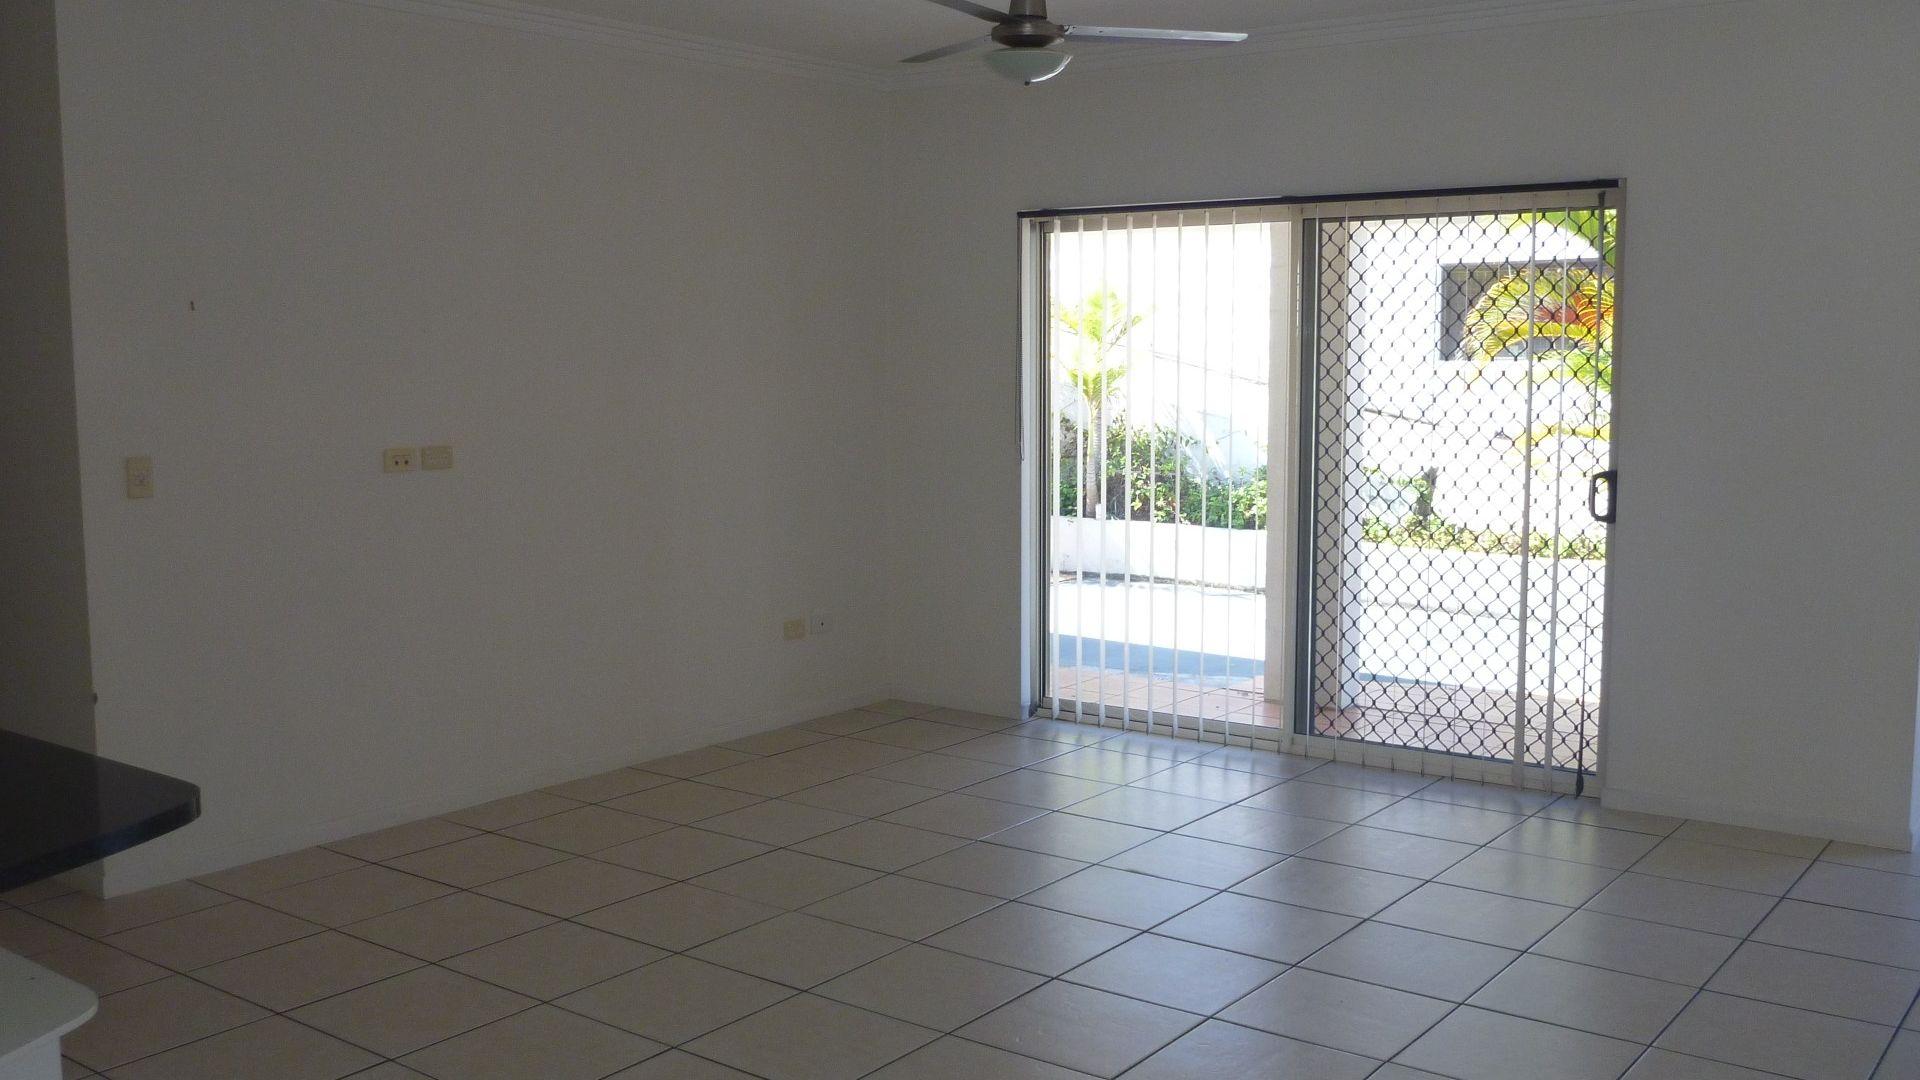 19A Mccann Street, South Gladstone QLD 4680, Image 2